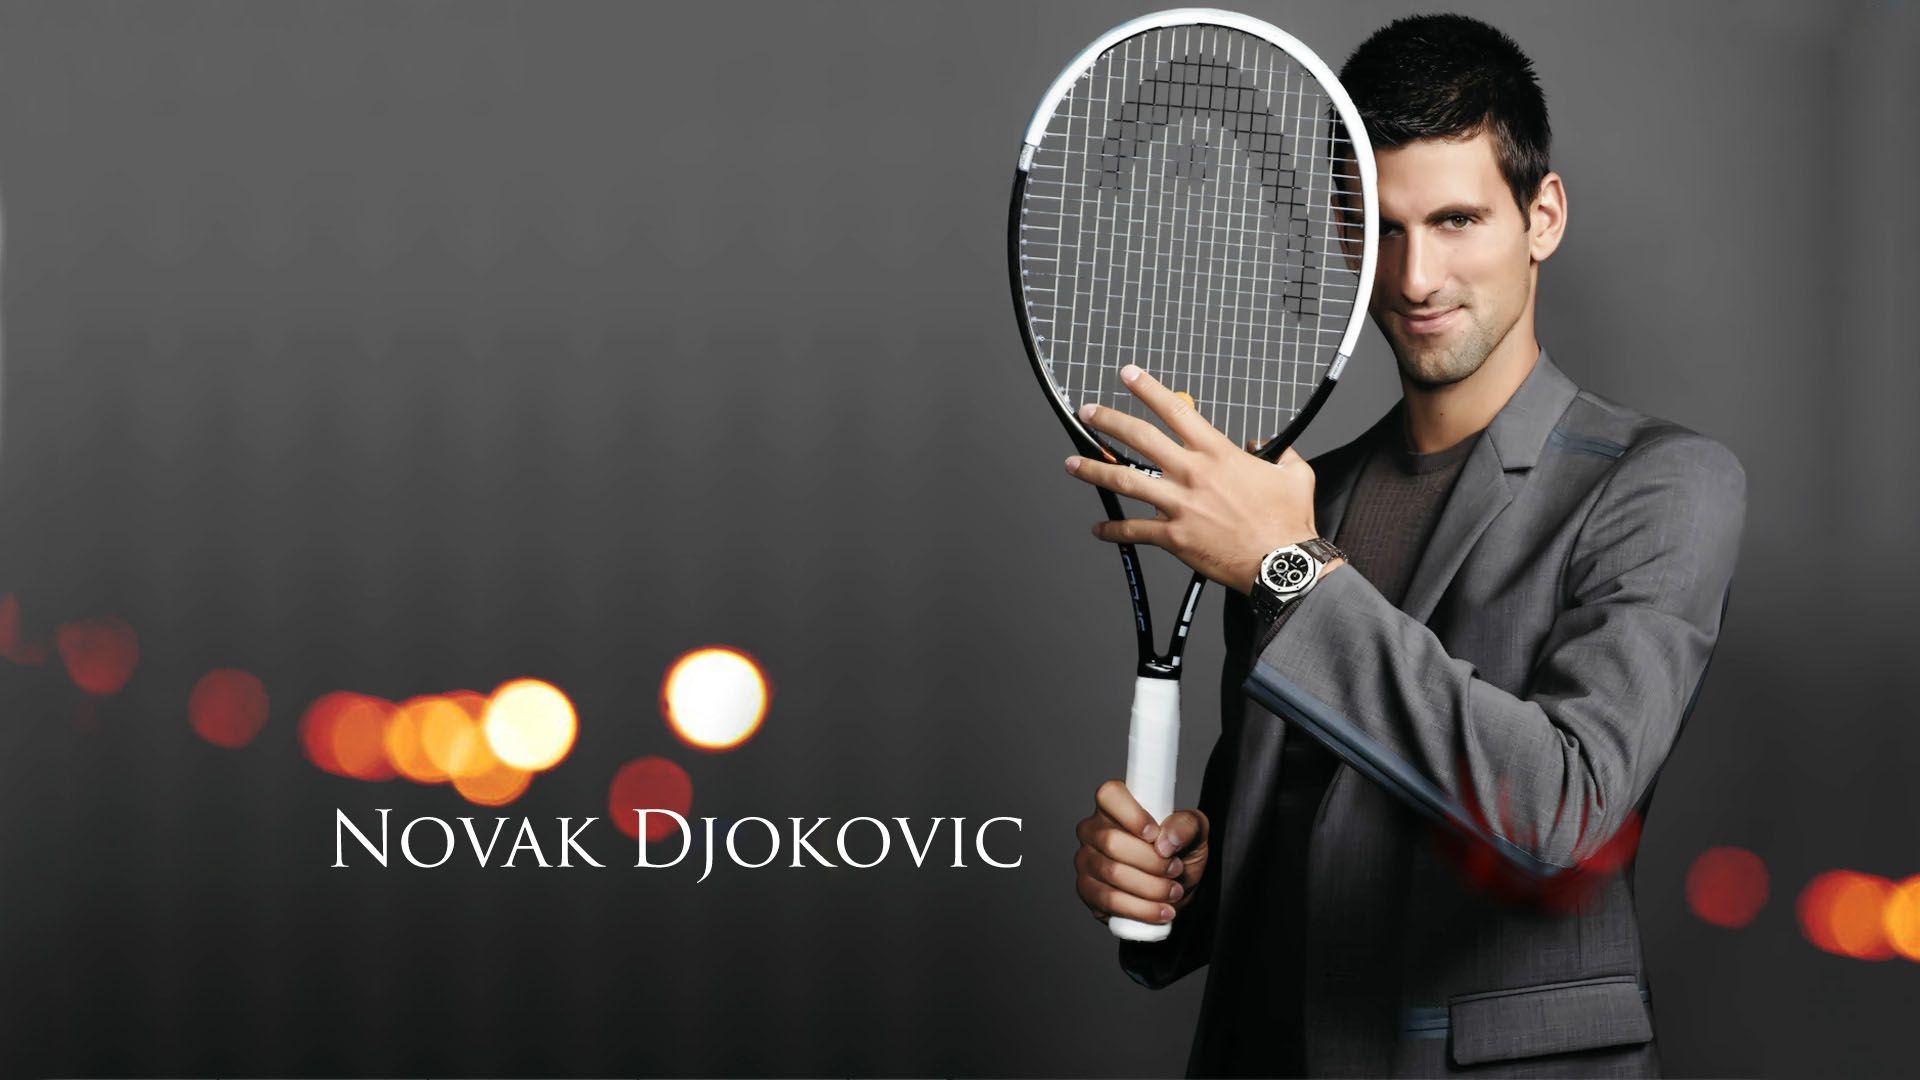 Novak Djokovic Best Tennis Player Image Novak Djokovic Tennis Wallpaper Tennis